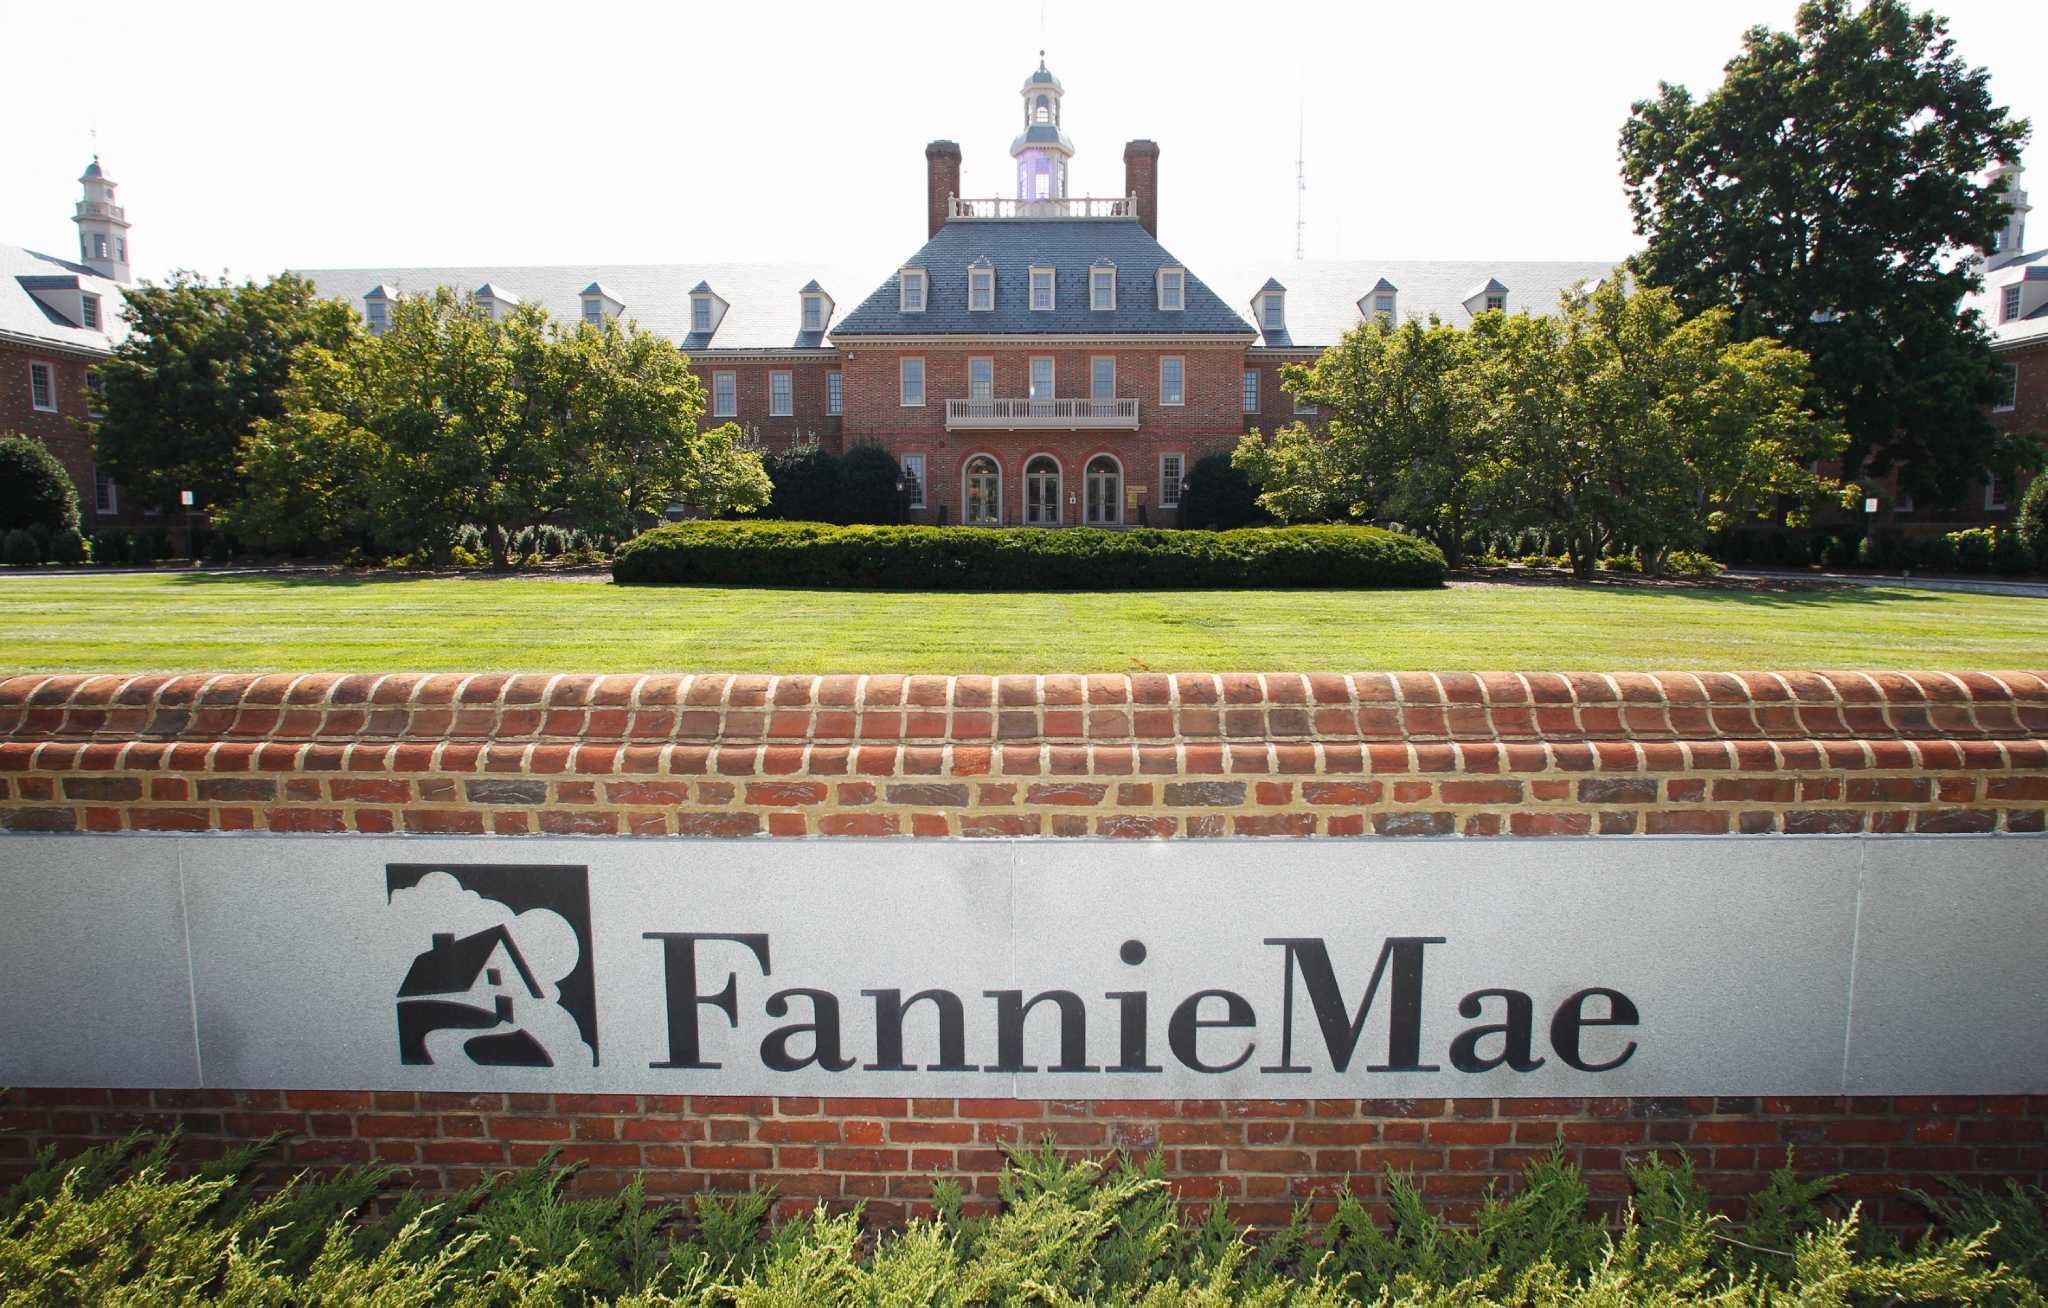 Fannie Mae predicts GDP growth will halve by 2020